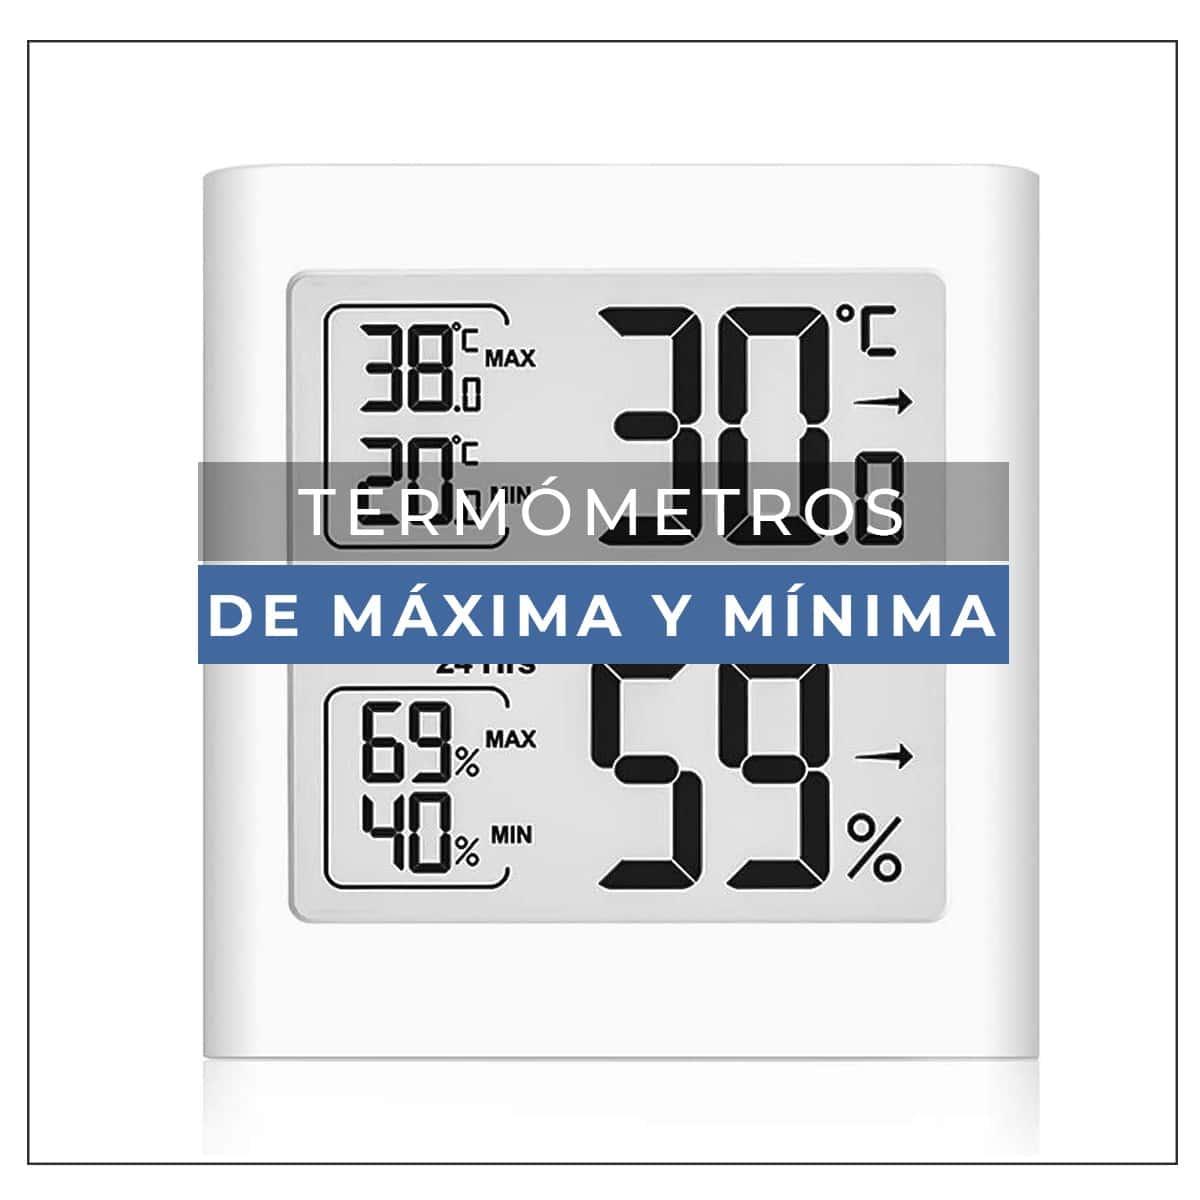 termometro maxima y minima